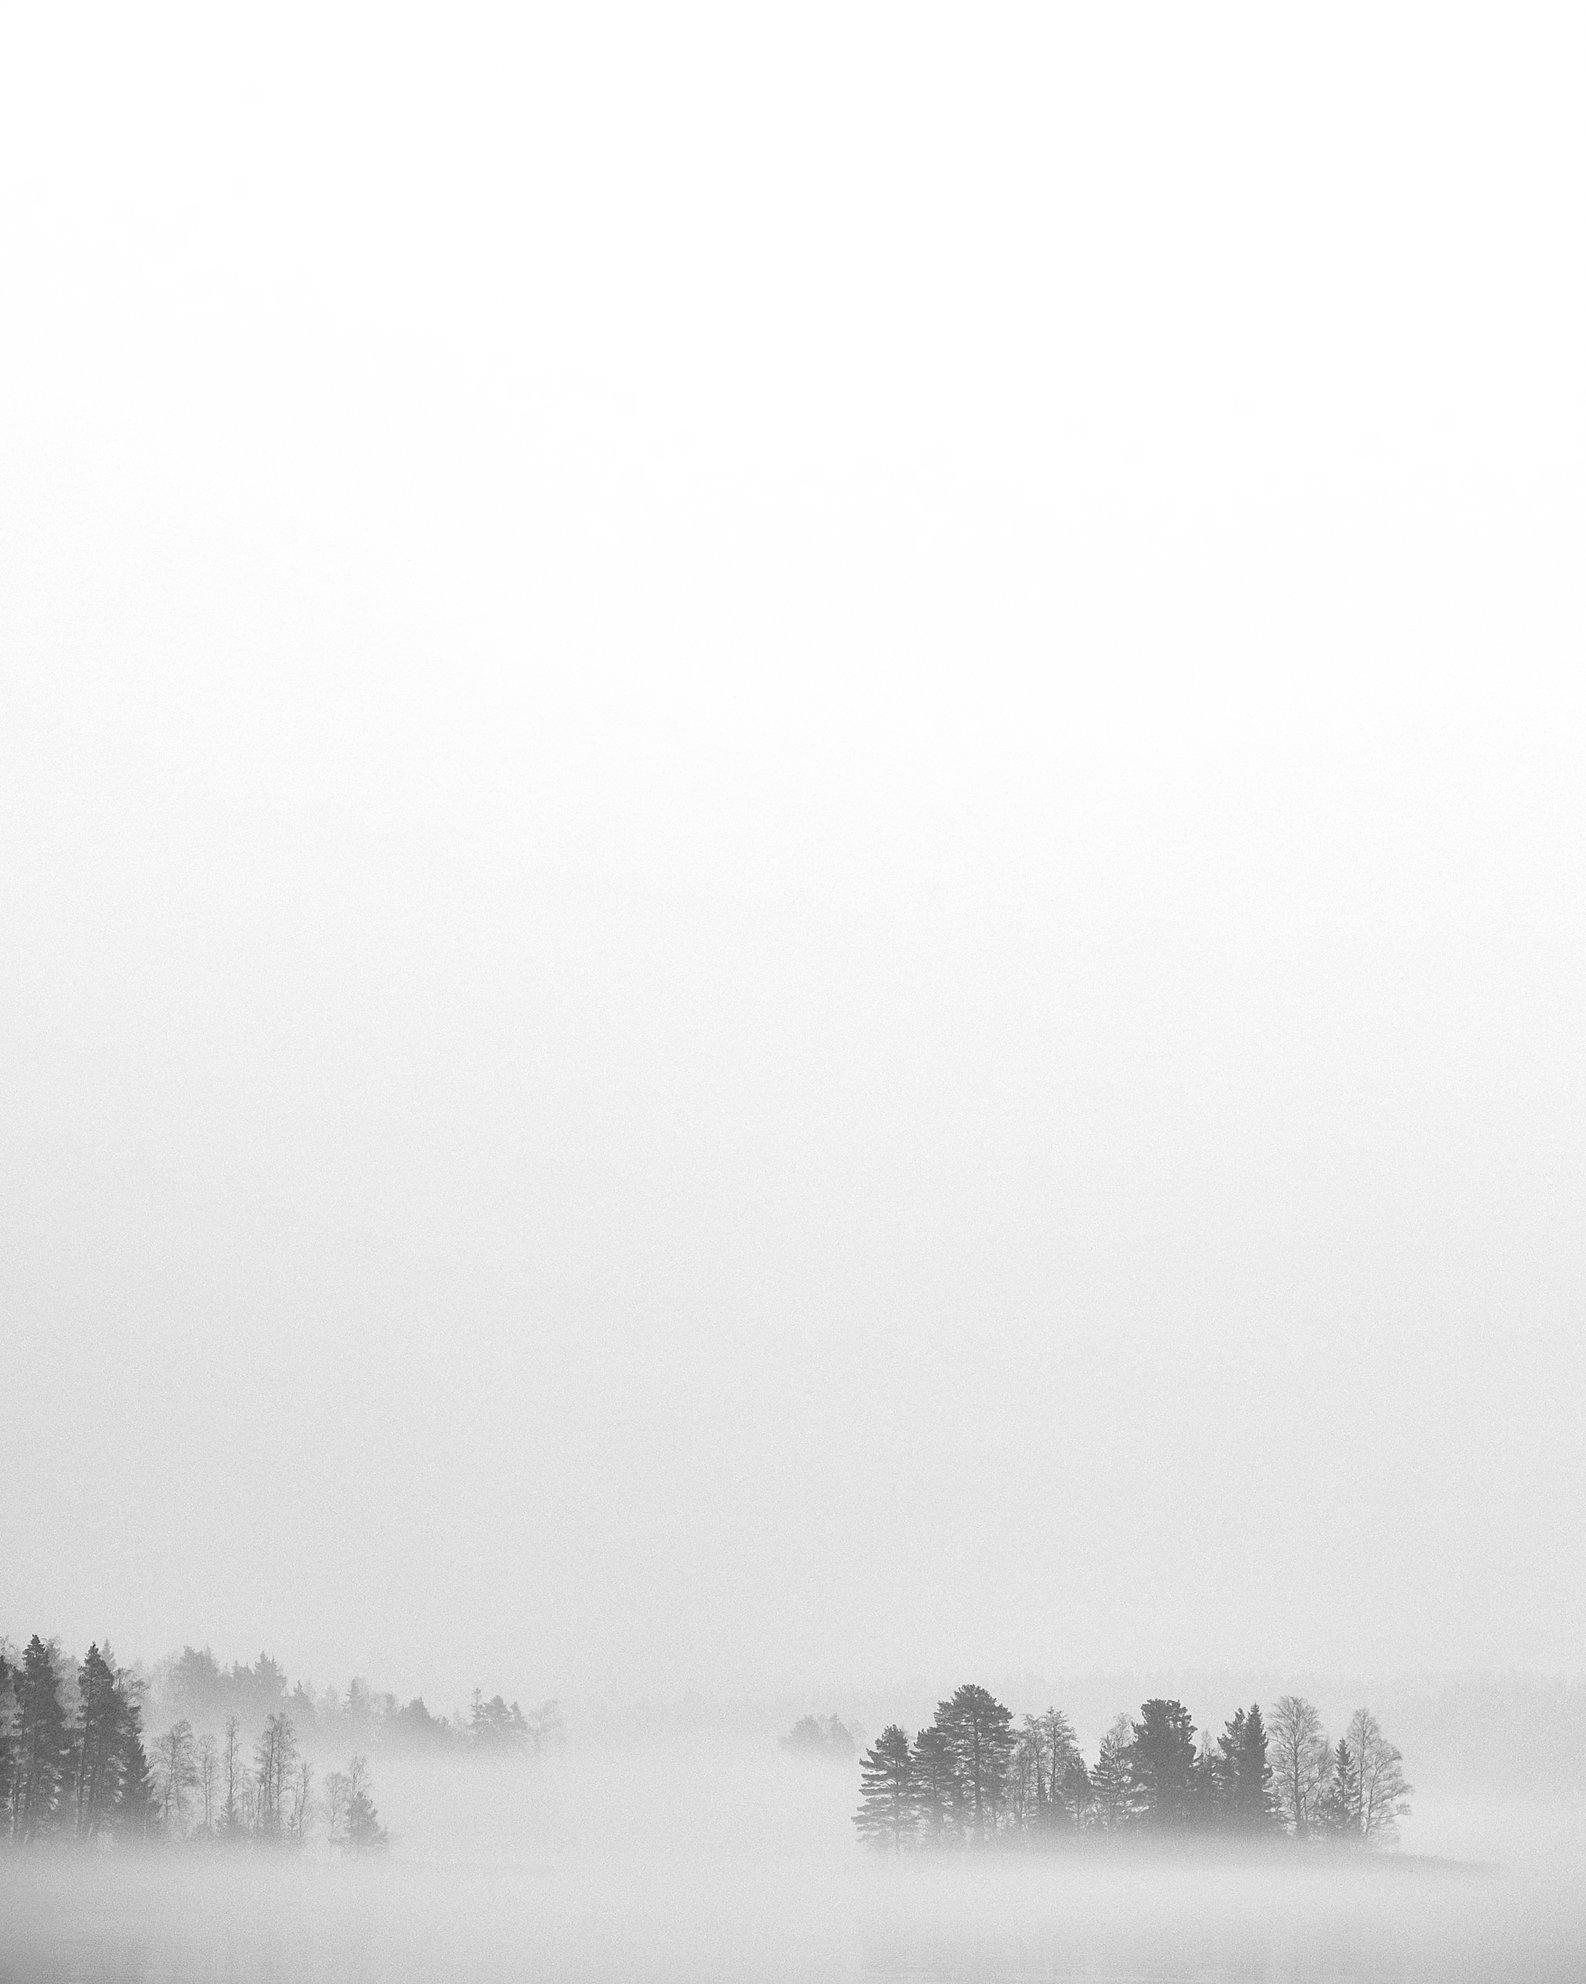 2018-11-06-Sastamala-0012.jpg